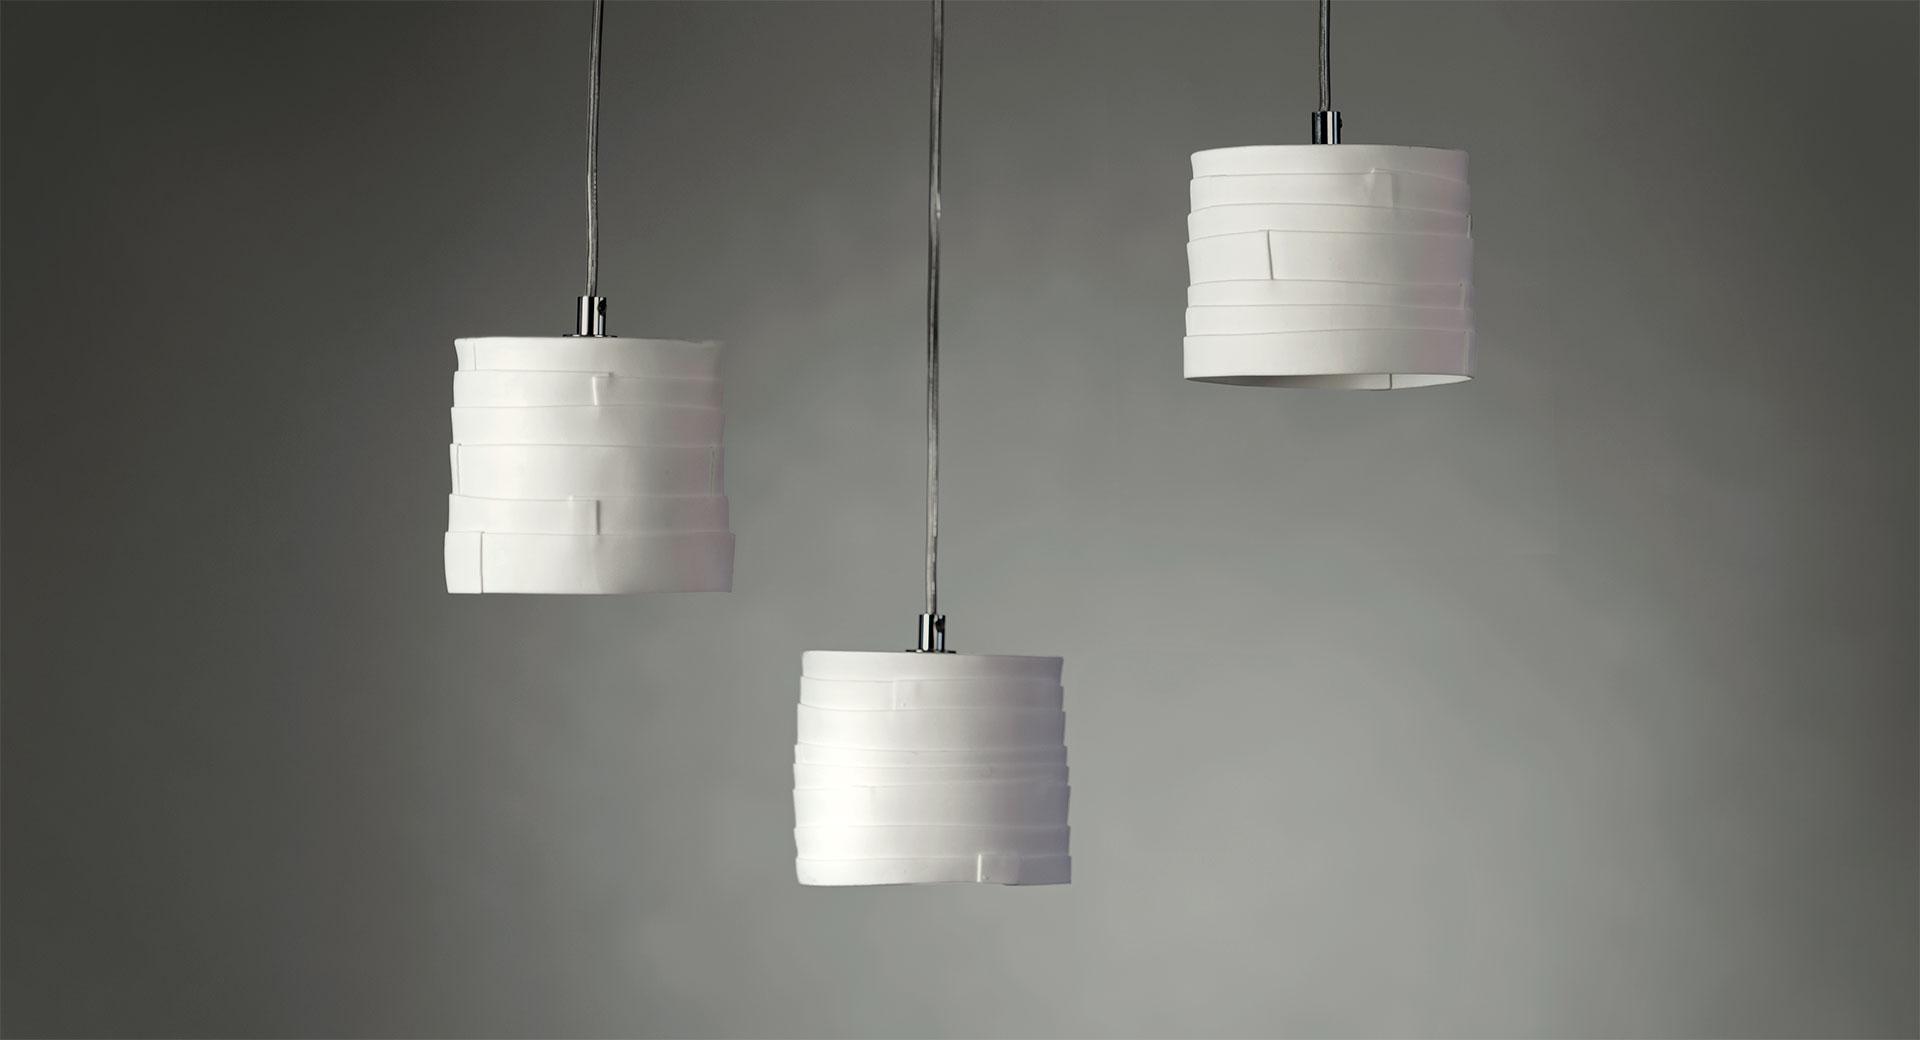 keramikwerke maria pohlkemper. Black Bedroom Furniture Sets. Home Design Ideas